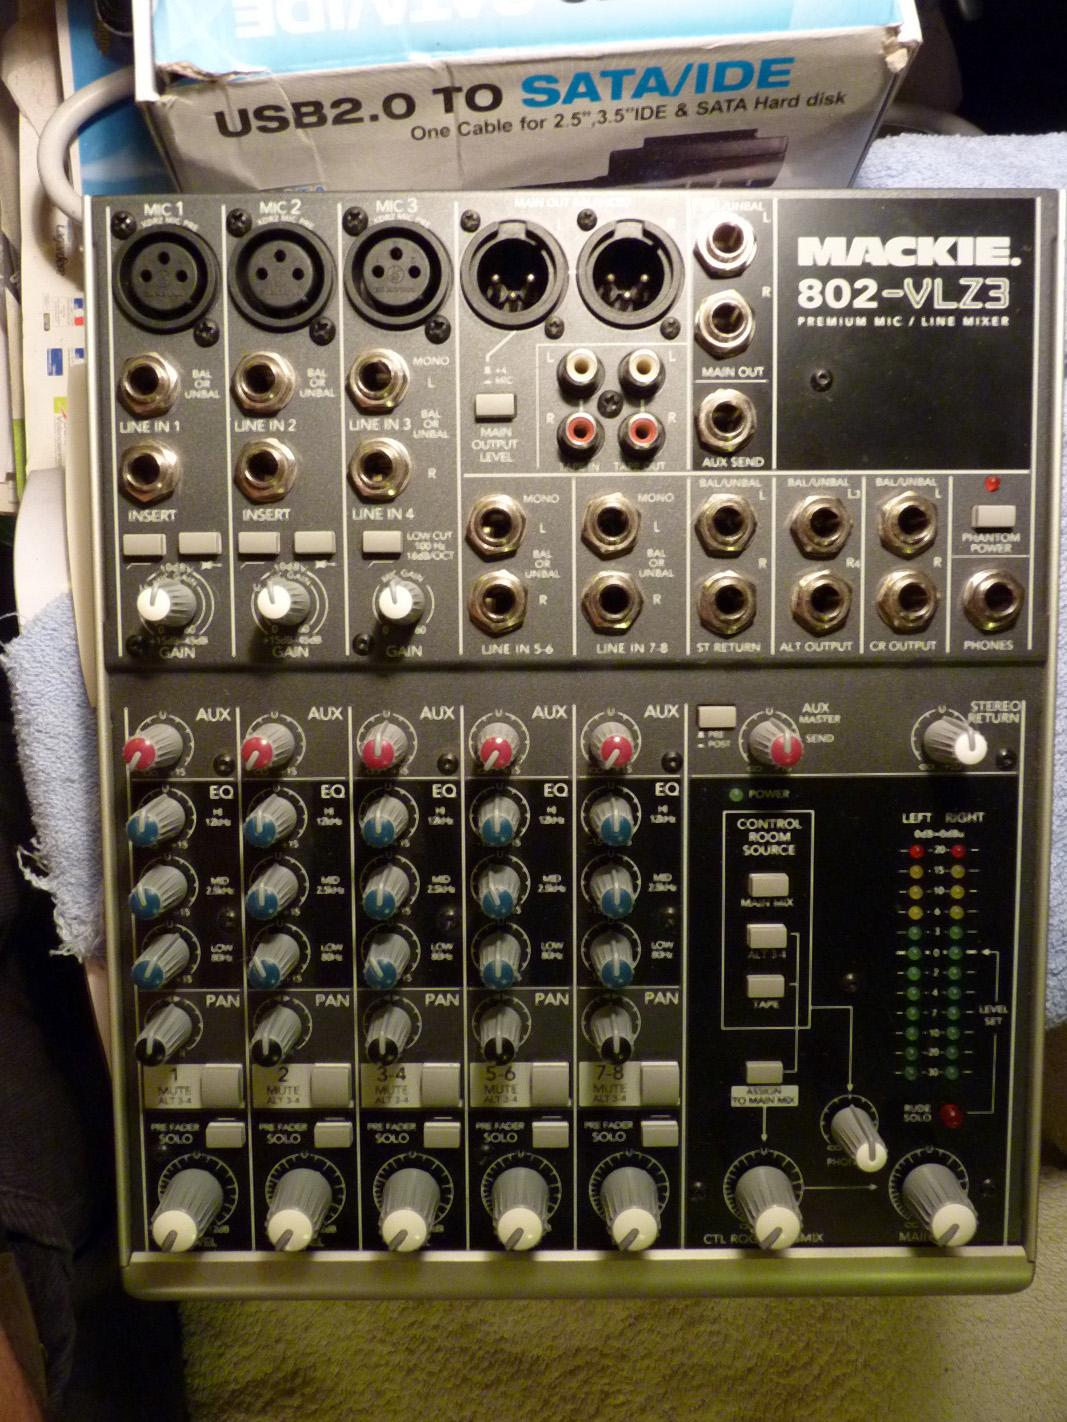 Mackie 802 VLZ3 Image 358156 Audiofanzine